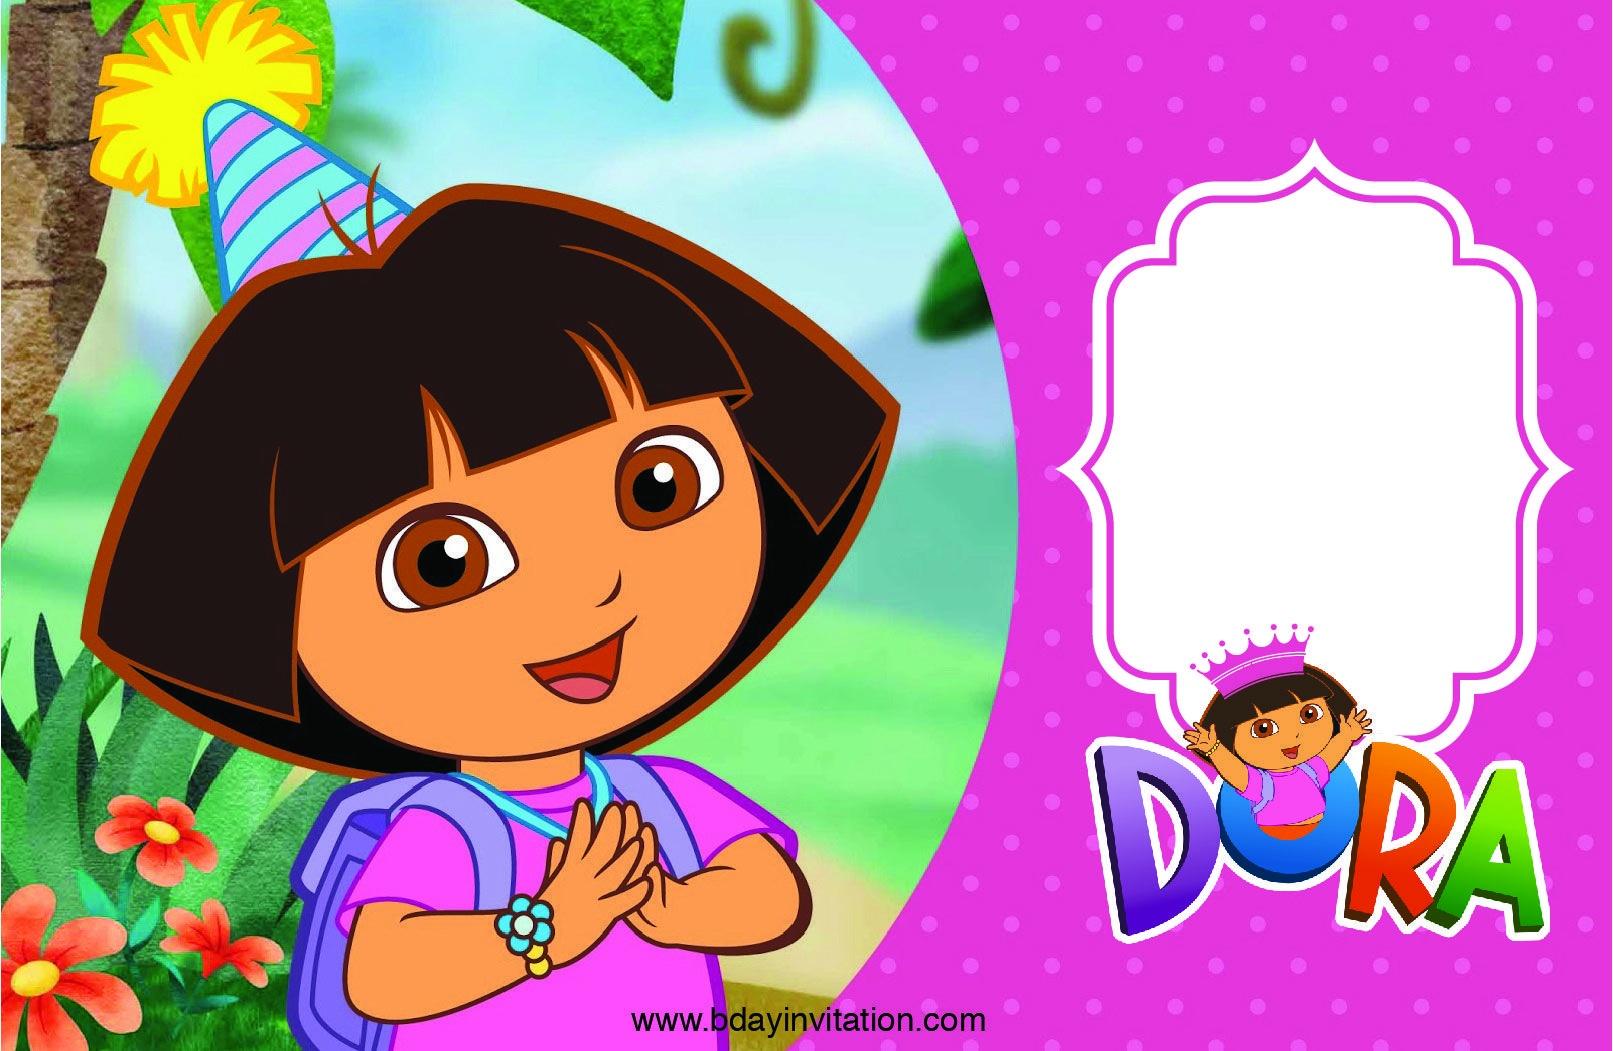 Free Free Printable Dora The Explore Birthday Invitation Template - Free Dora Party Printables